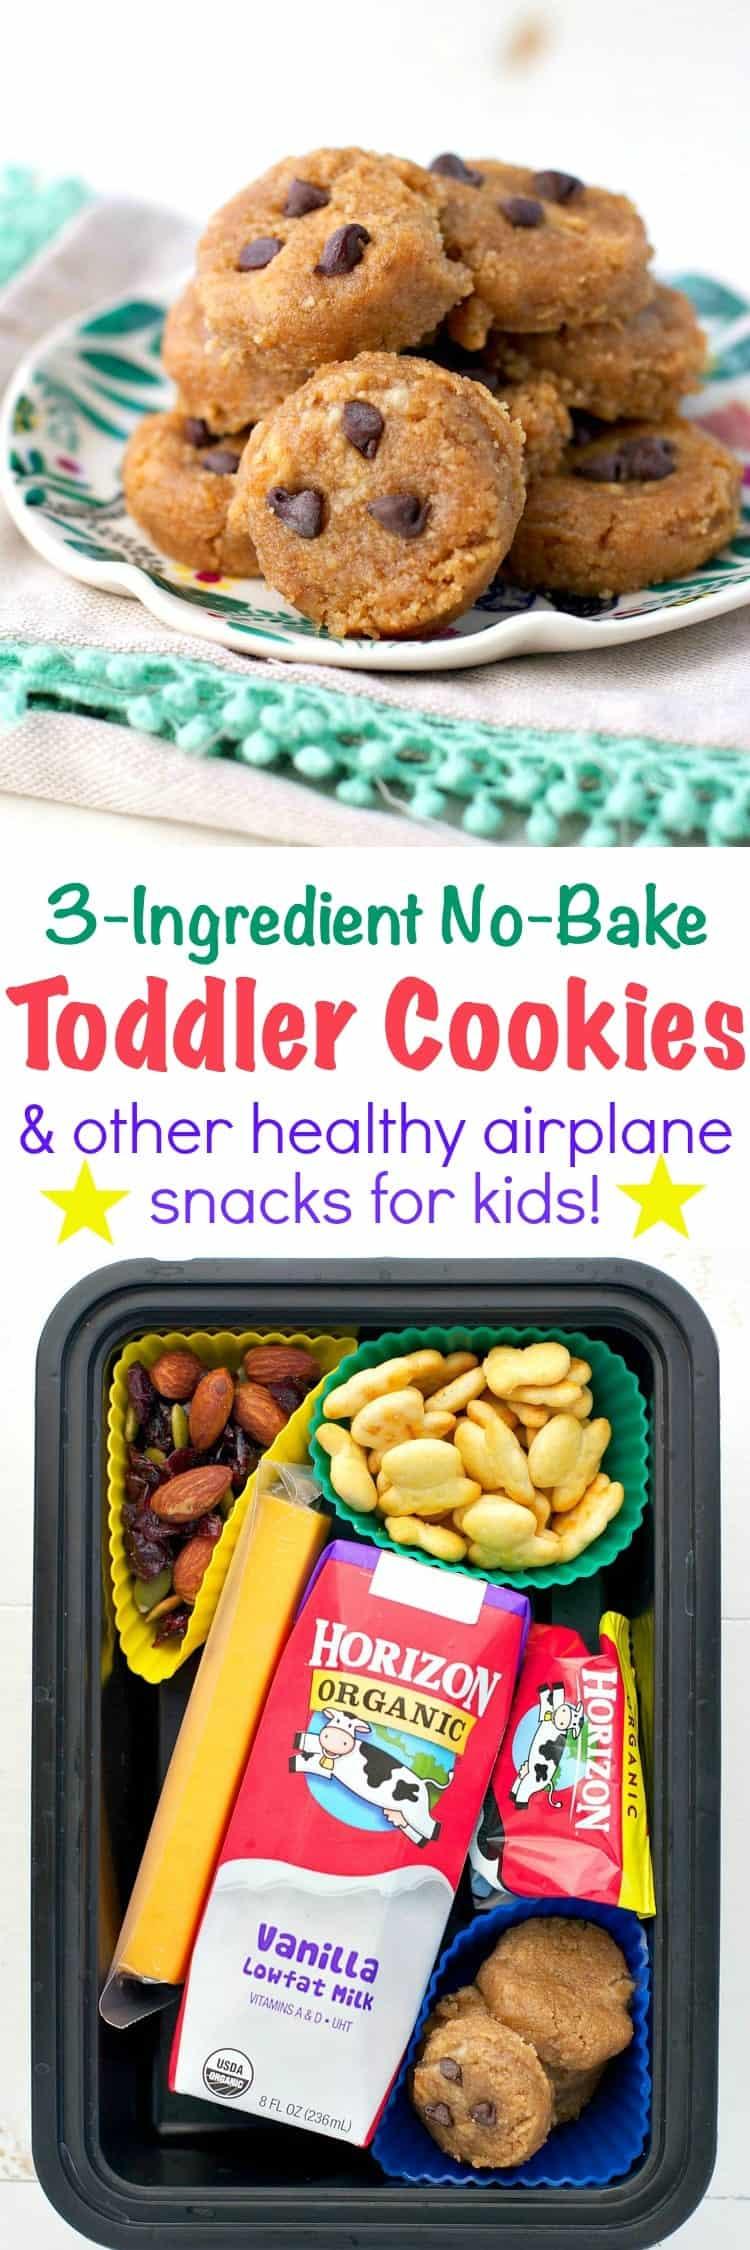 3 Ingredient No Bake Toddler Cookies Airplane Snacks For Kids The Seasoned Mom